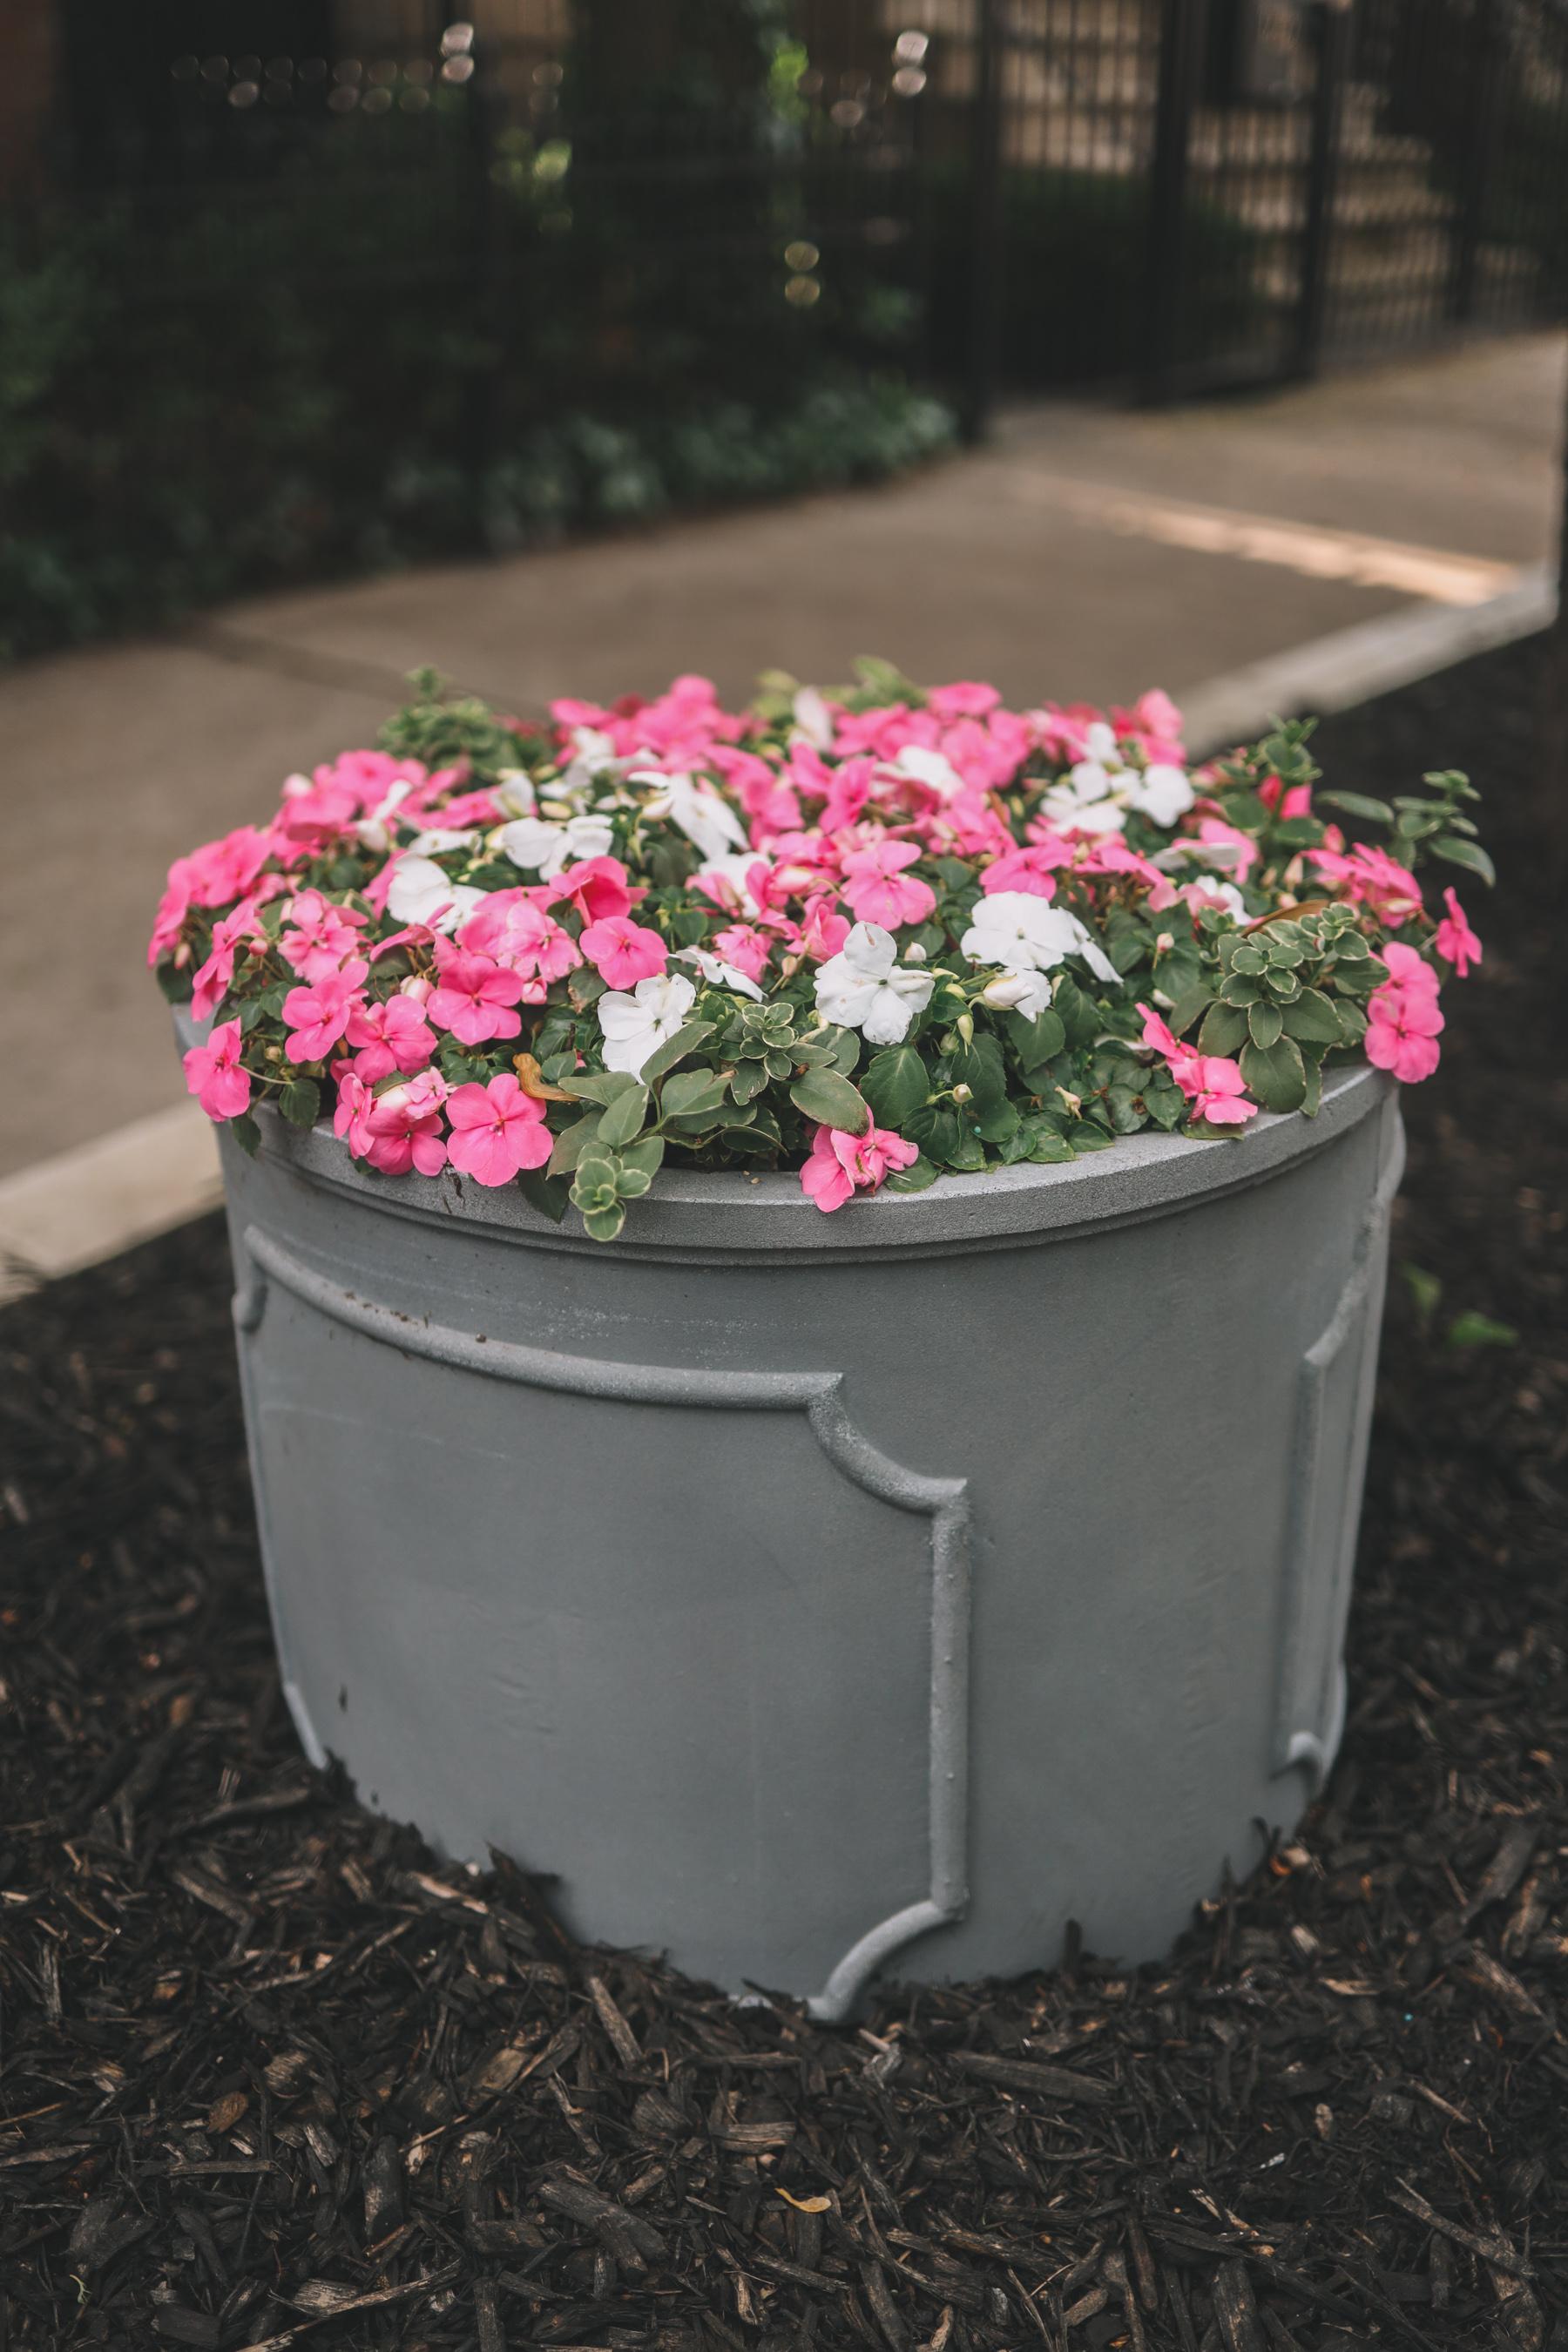 Planting Impatiens